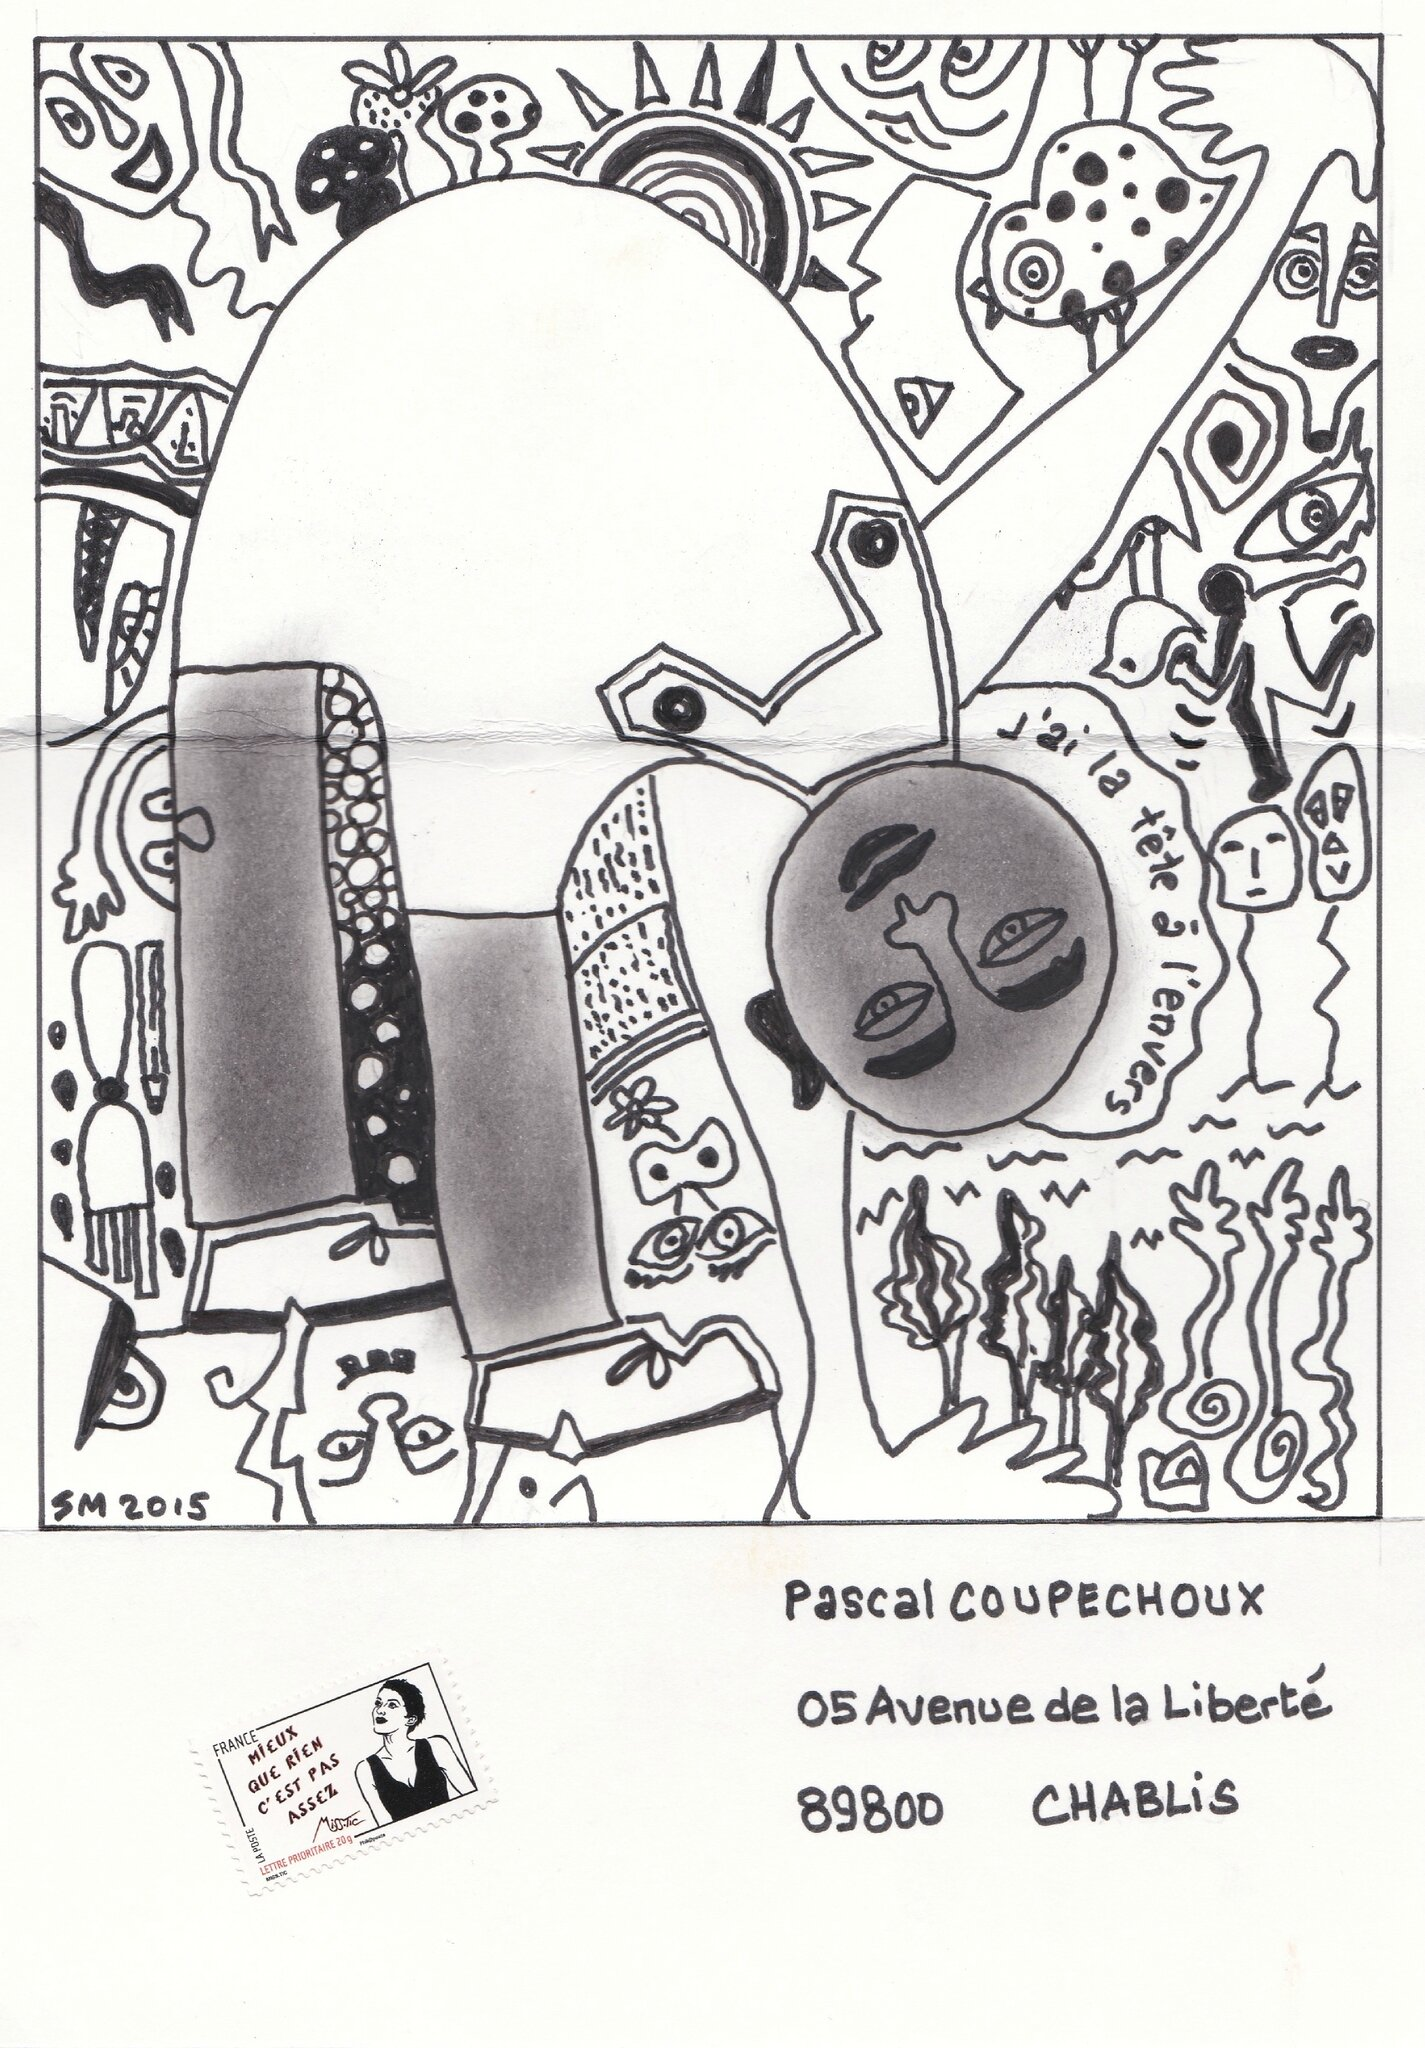 Pascal coupechoux1